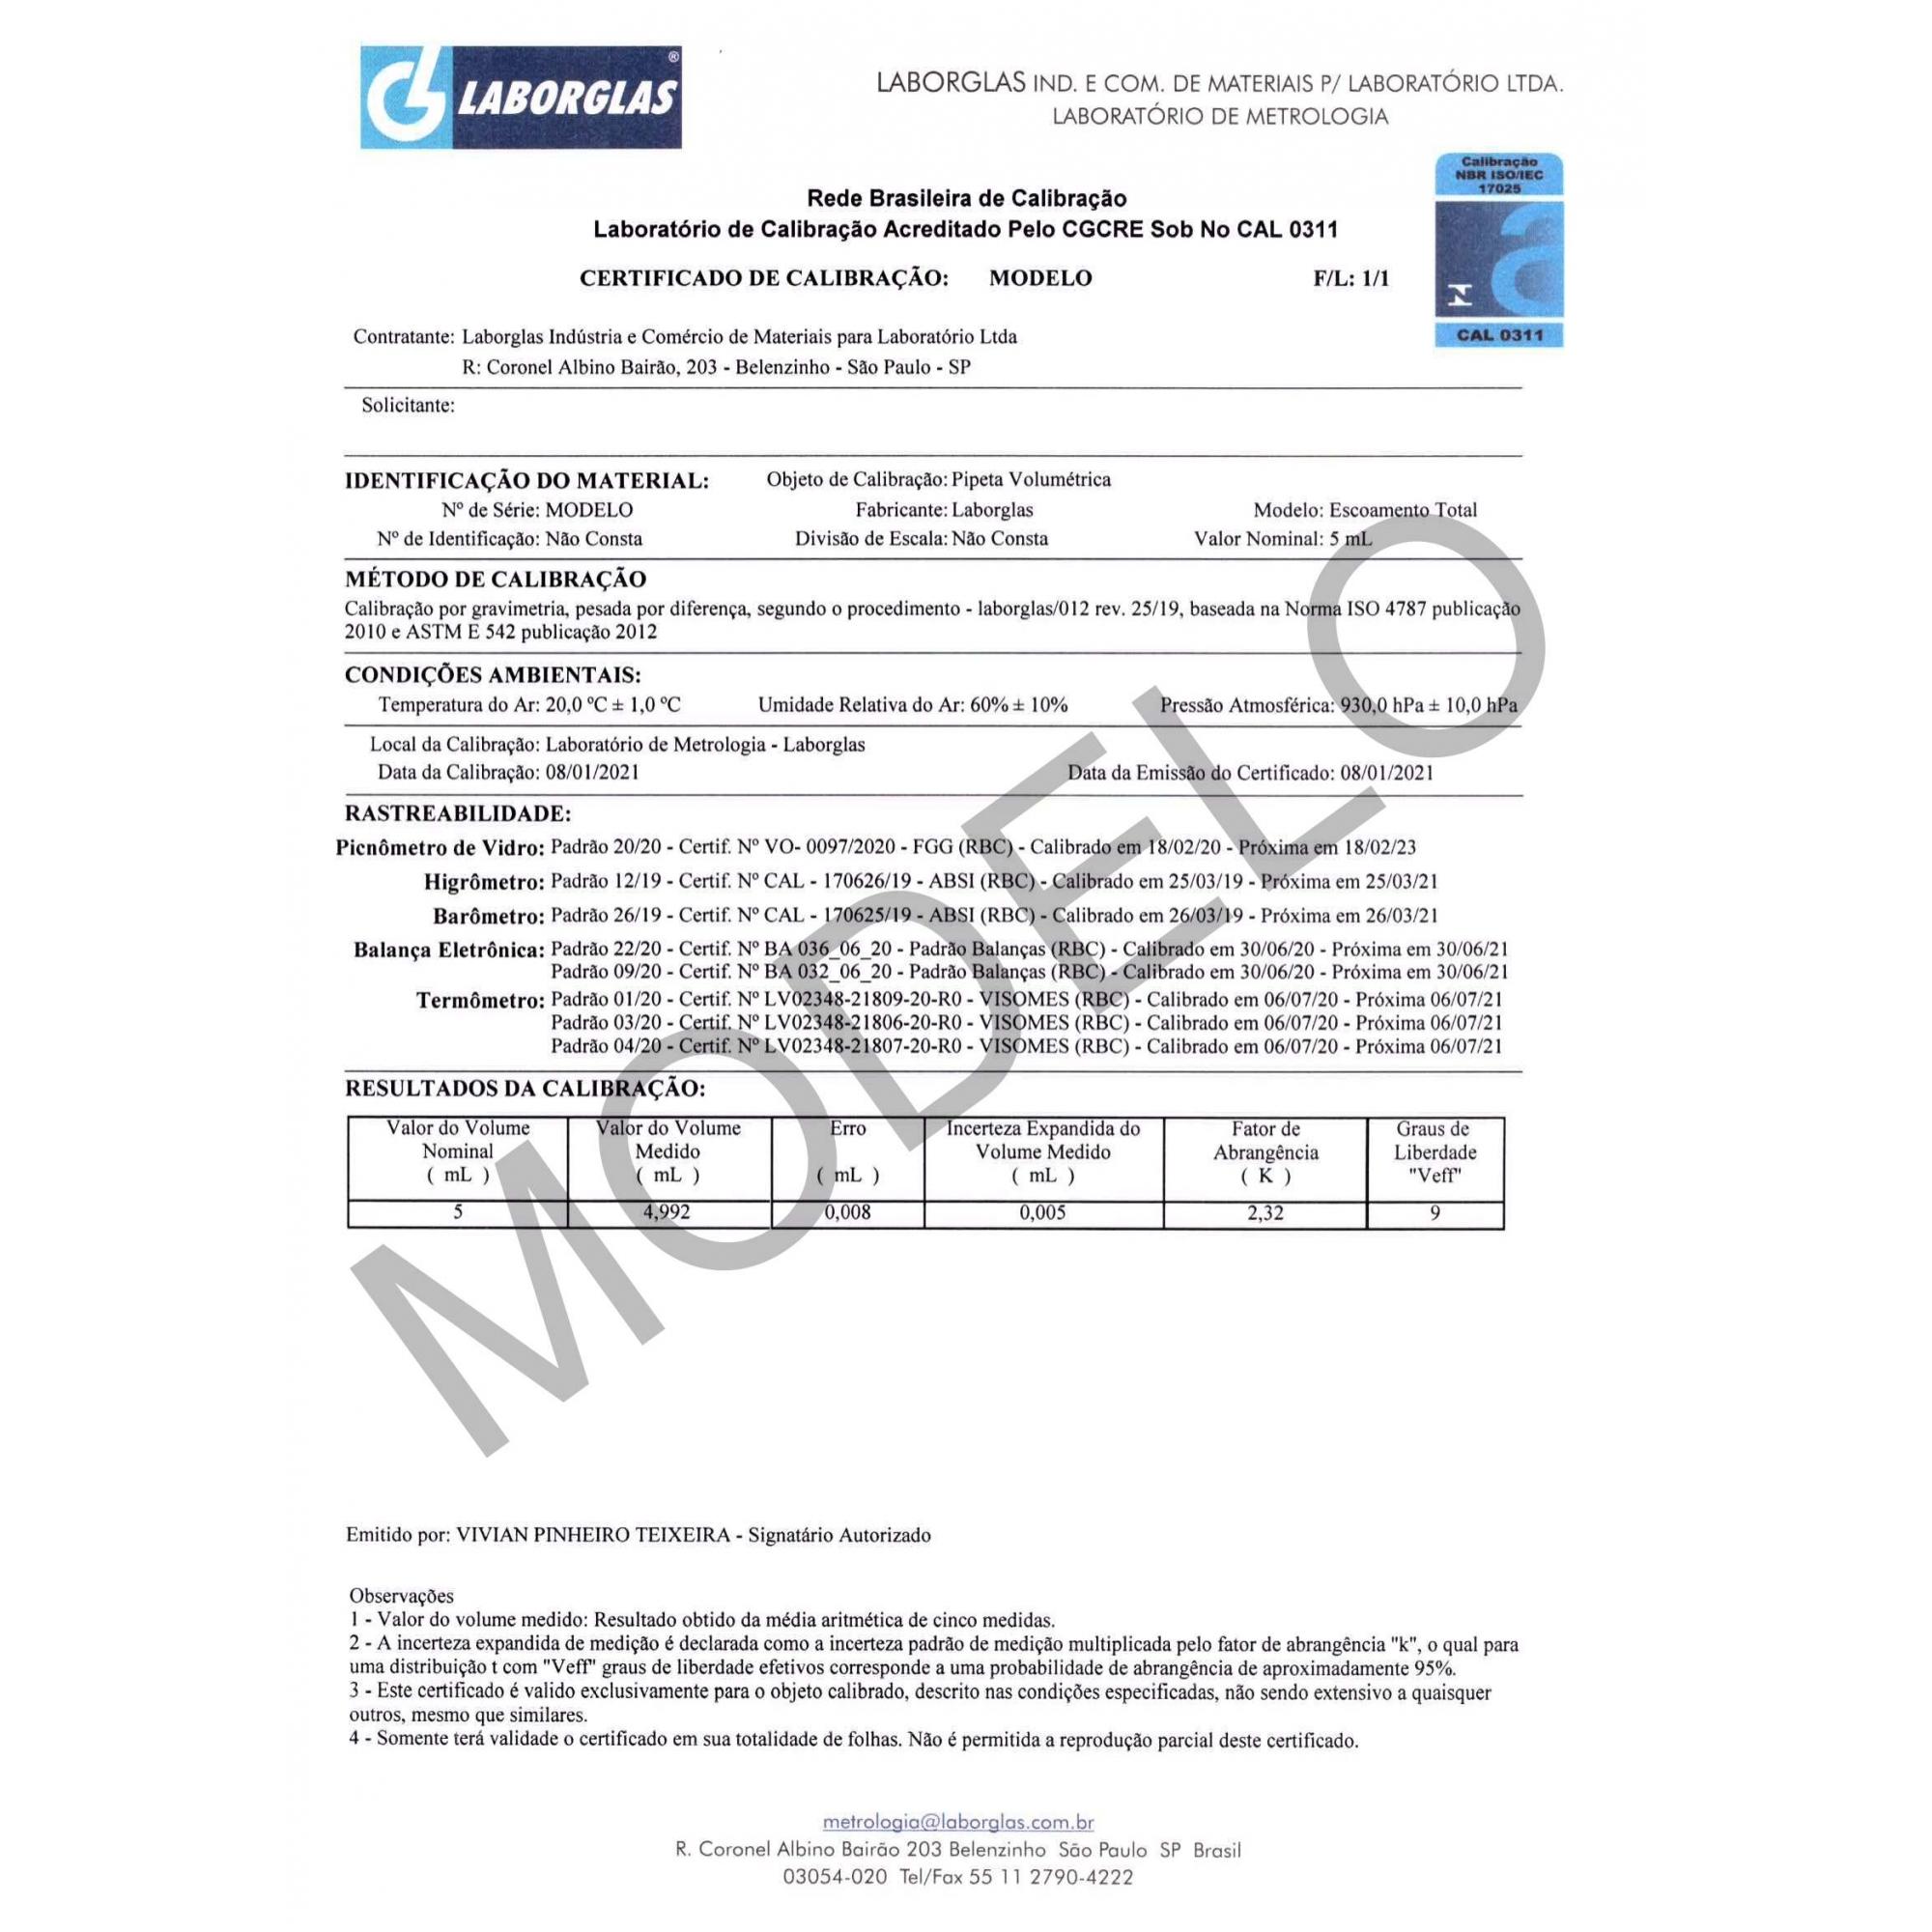 PIPETA VOLUMÉTRICA ESGOTAMENTO TOTAL 50 ML CERTIFICADO RBC - Laborglas - Cód. 9433716-R